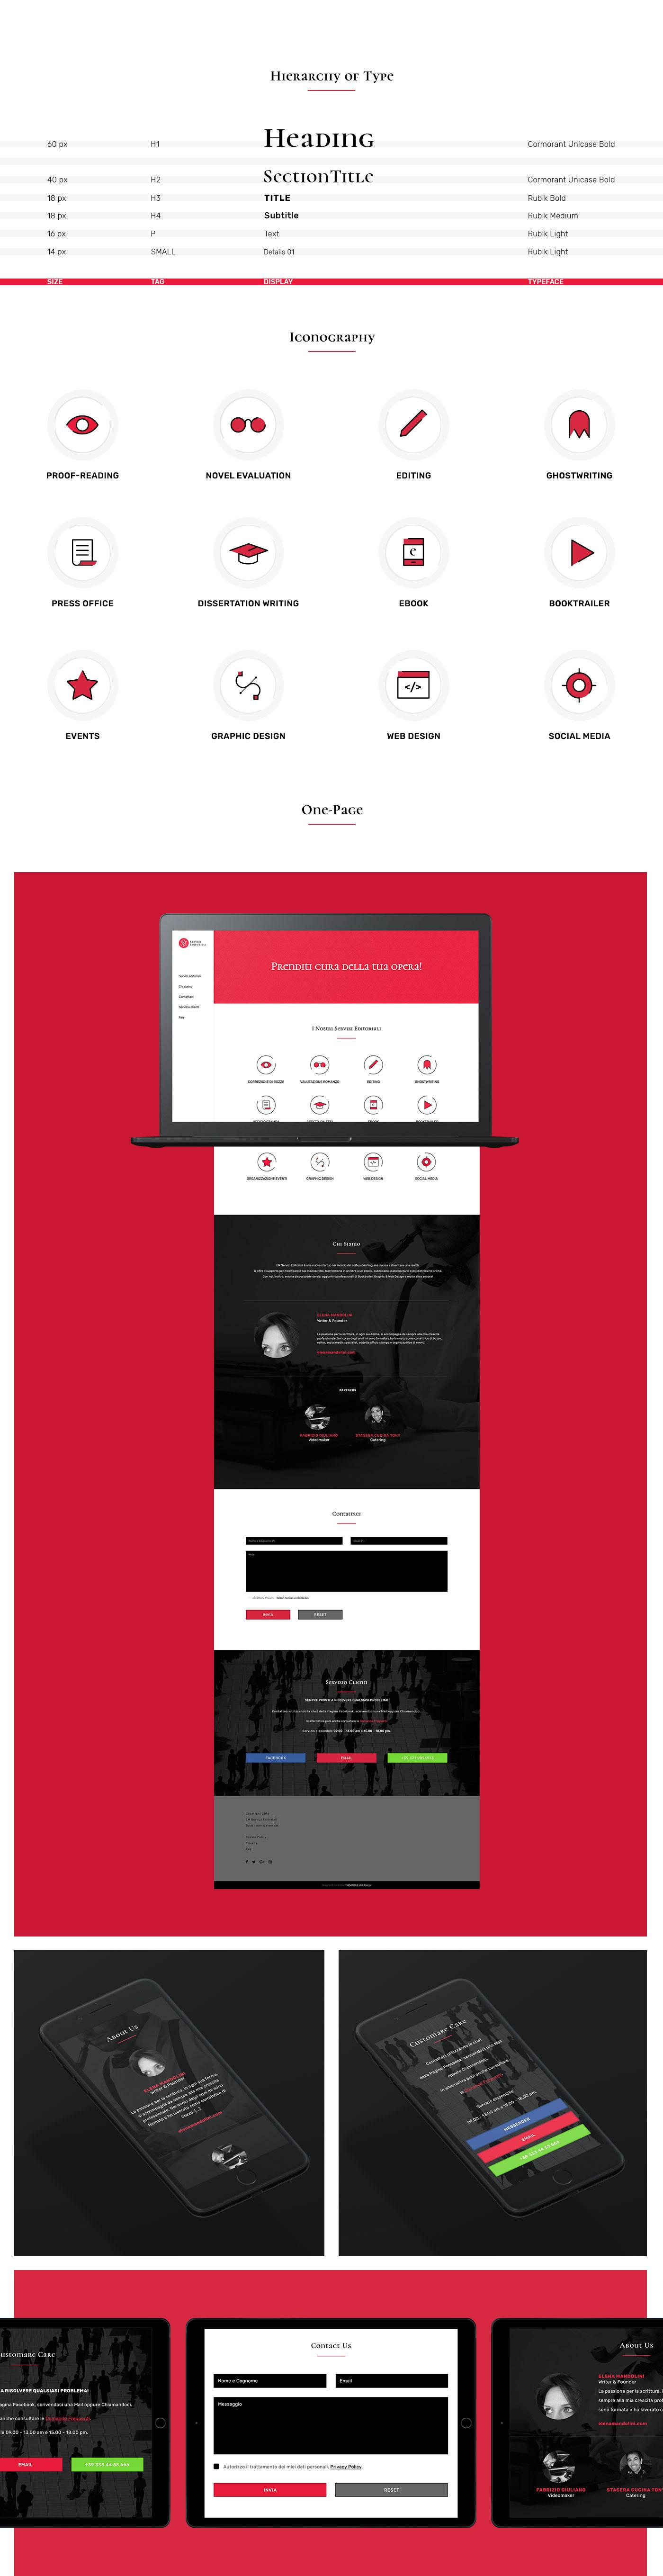 brand graphic Website onepage landingpage red black design editorial Responsive